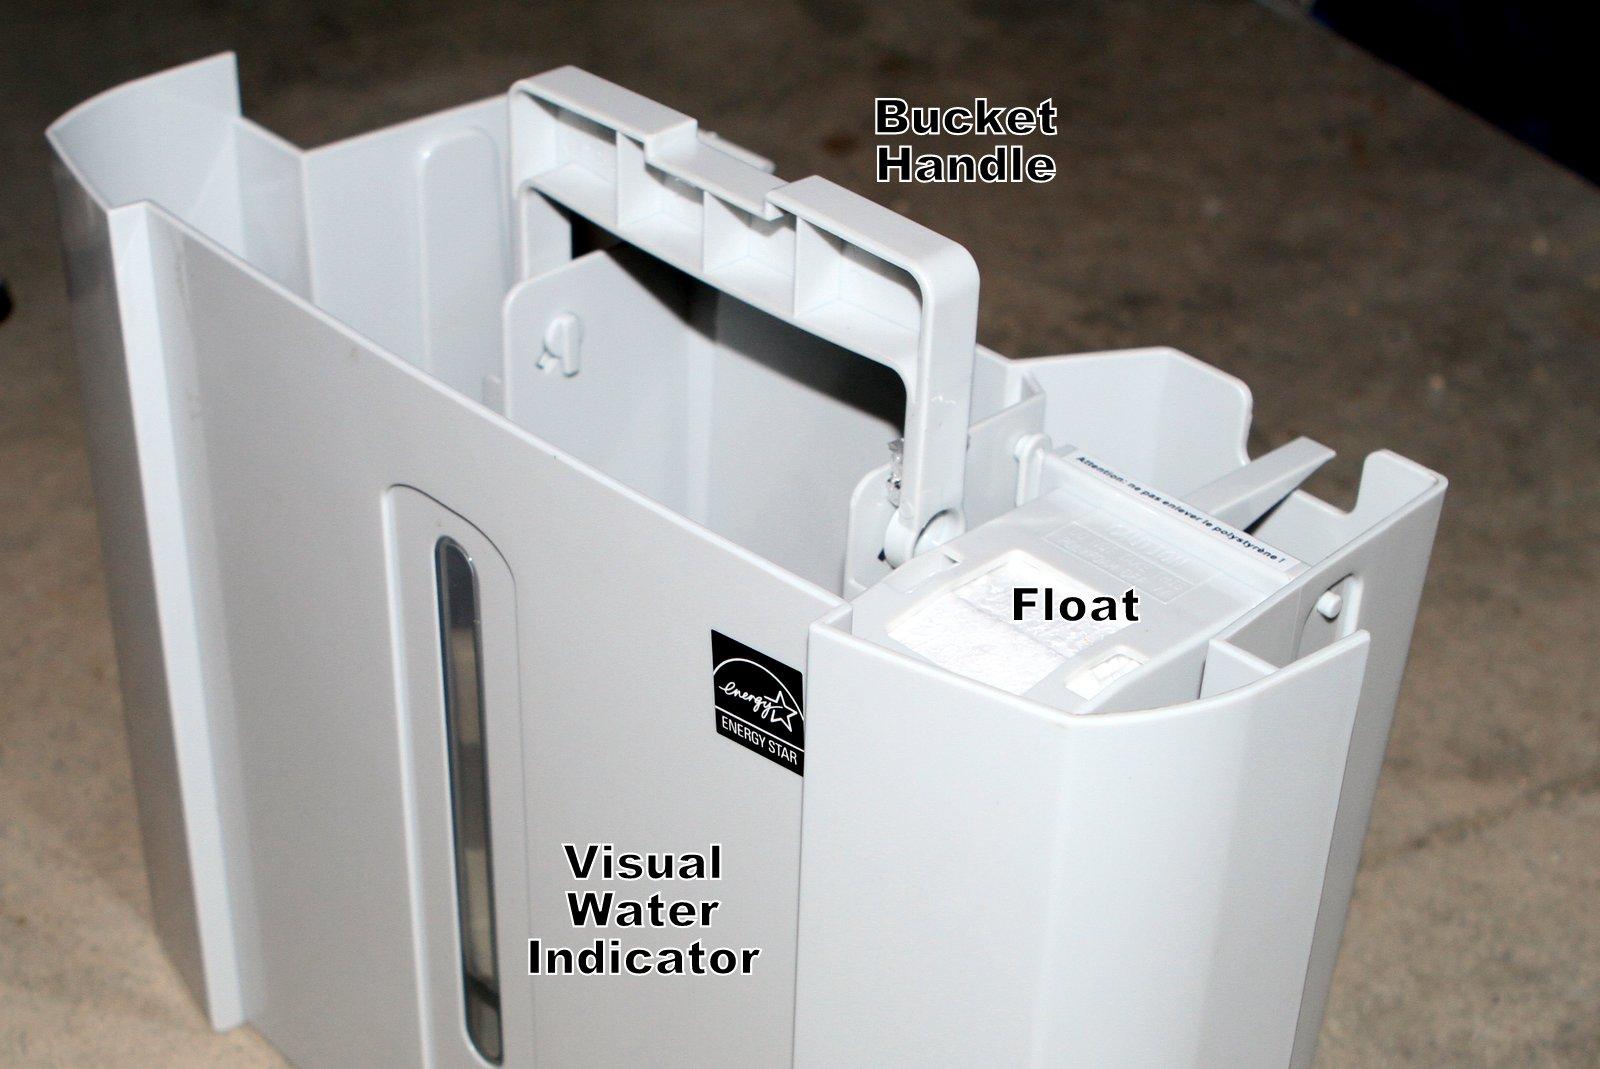 Timed Dehumidifier For Energy Savings